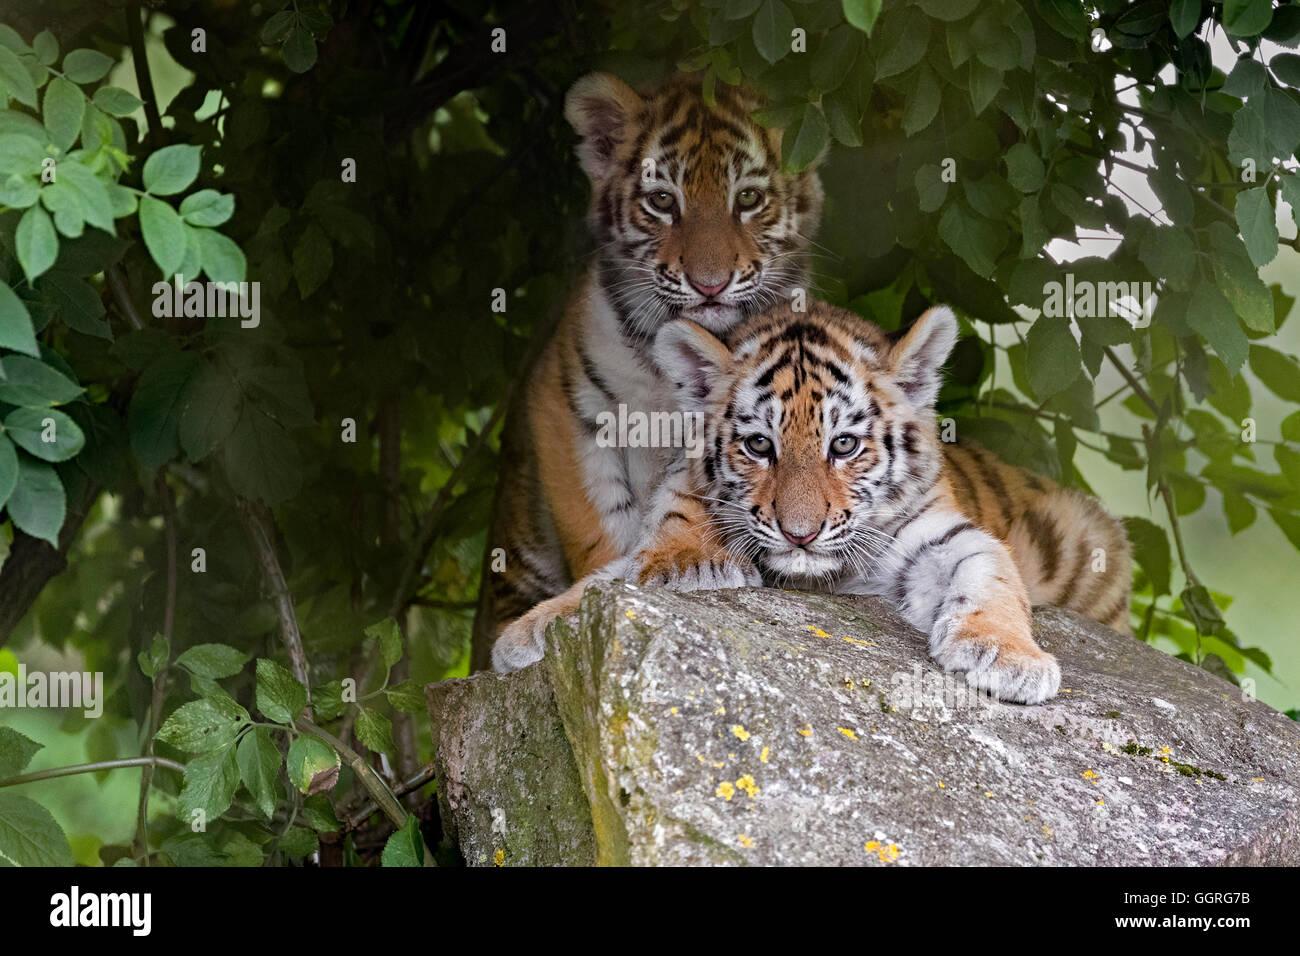 Amur tiger cubs, 11 weeks old. - Stock Image